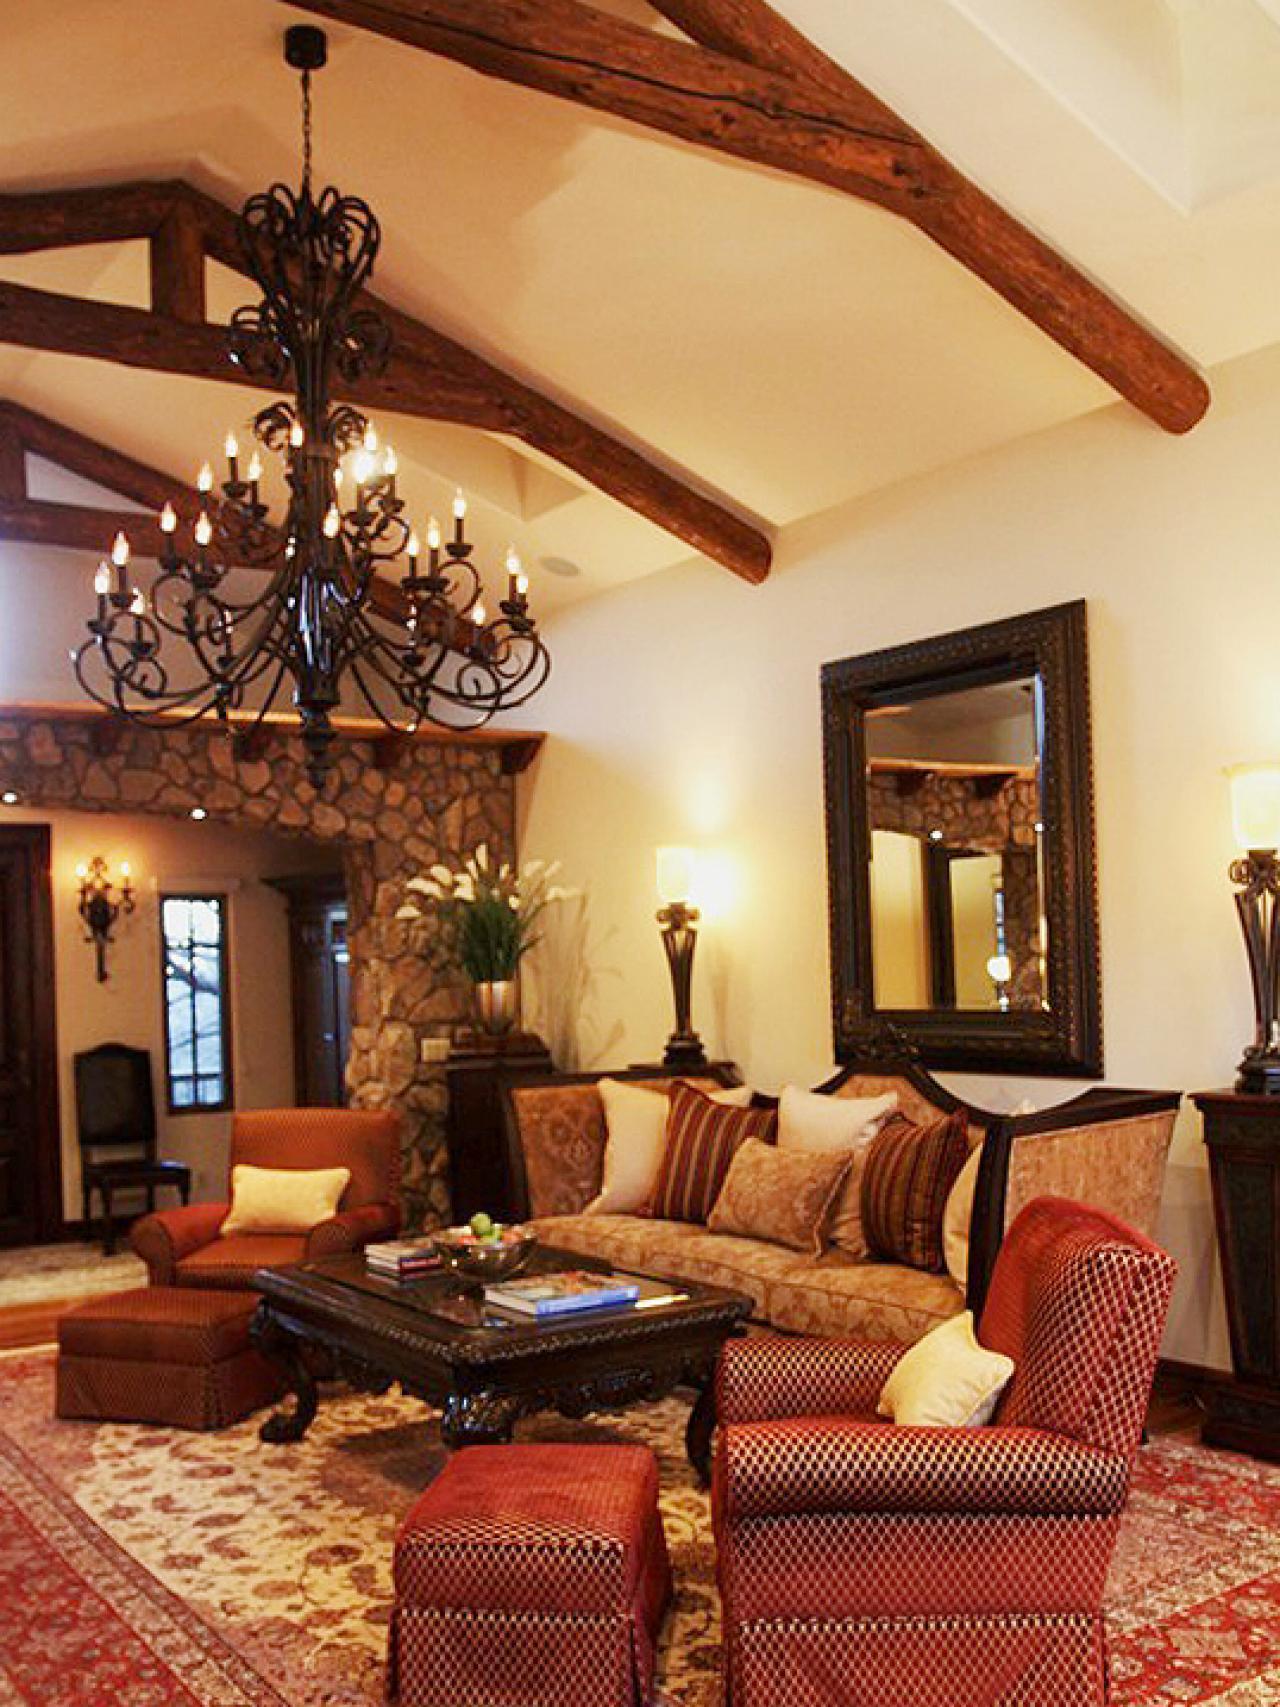 a living room in spanish Spanish Colonial Remodel   Mediterranean   Living Room   Phoenix  426 X 640